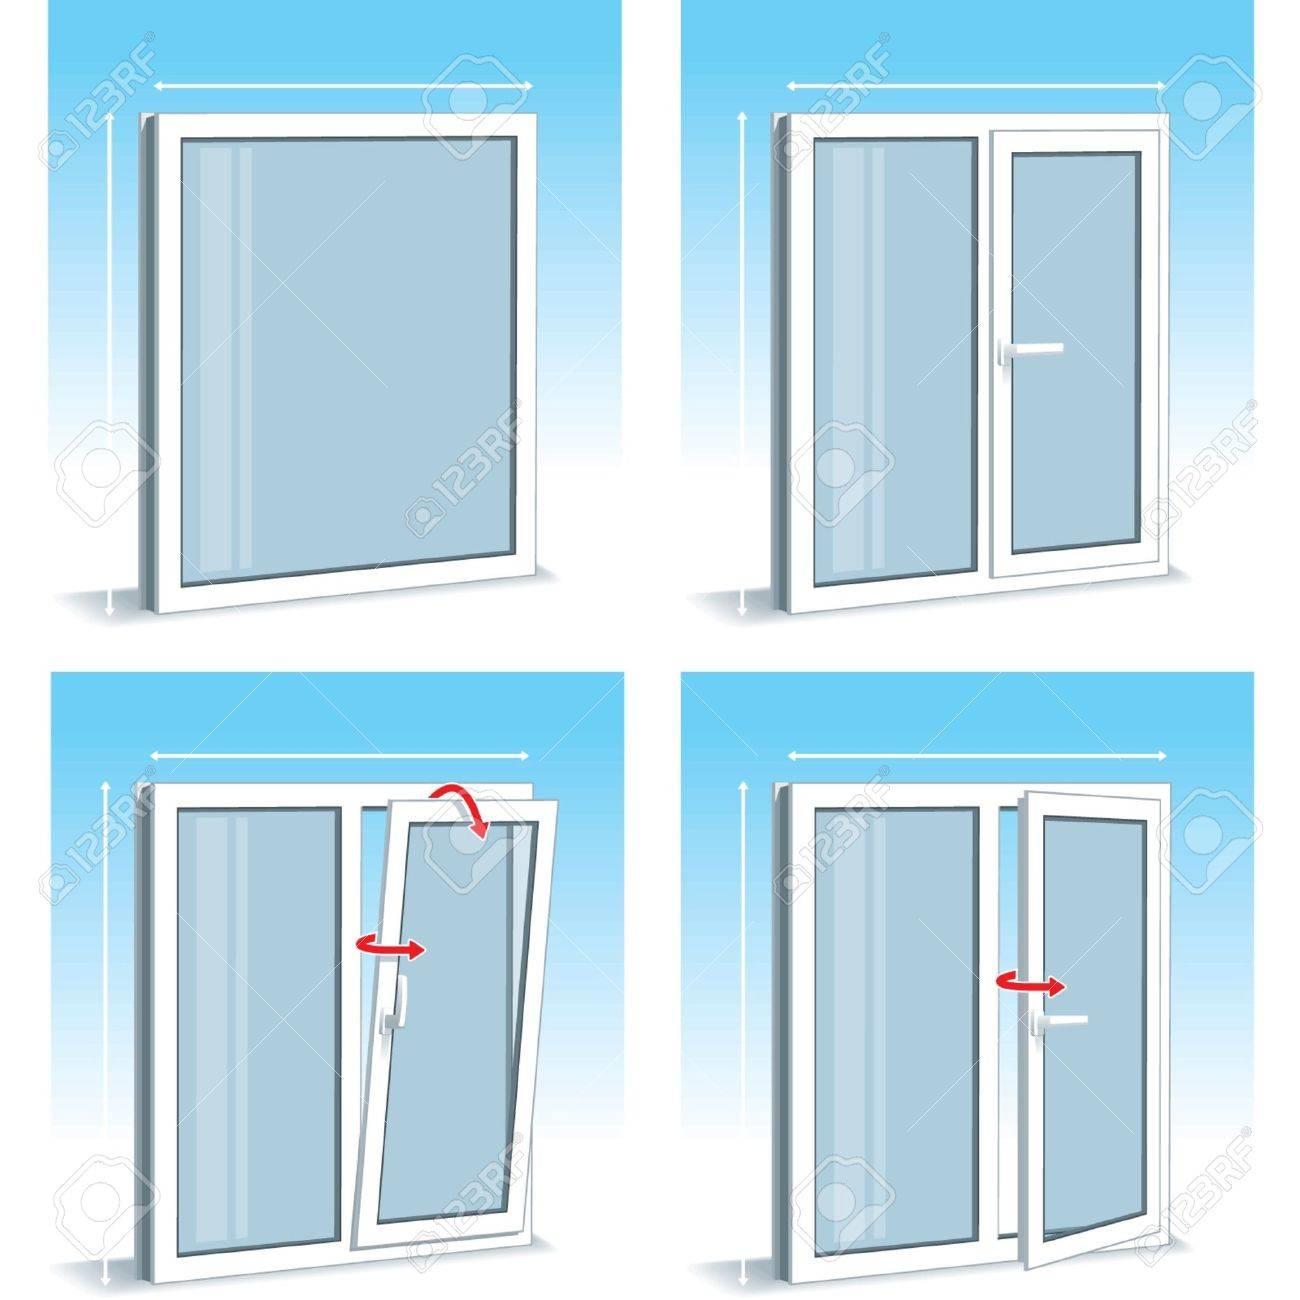 Ventanas Pvc Stock.Set Of Plastic Pvc Window Types